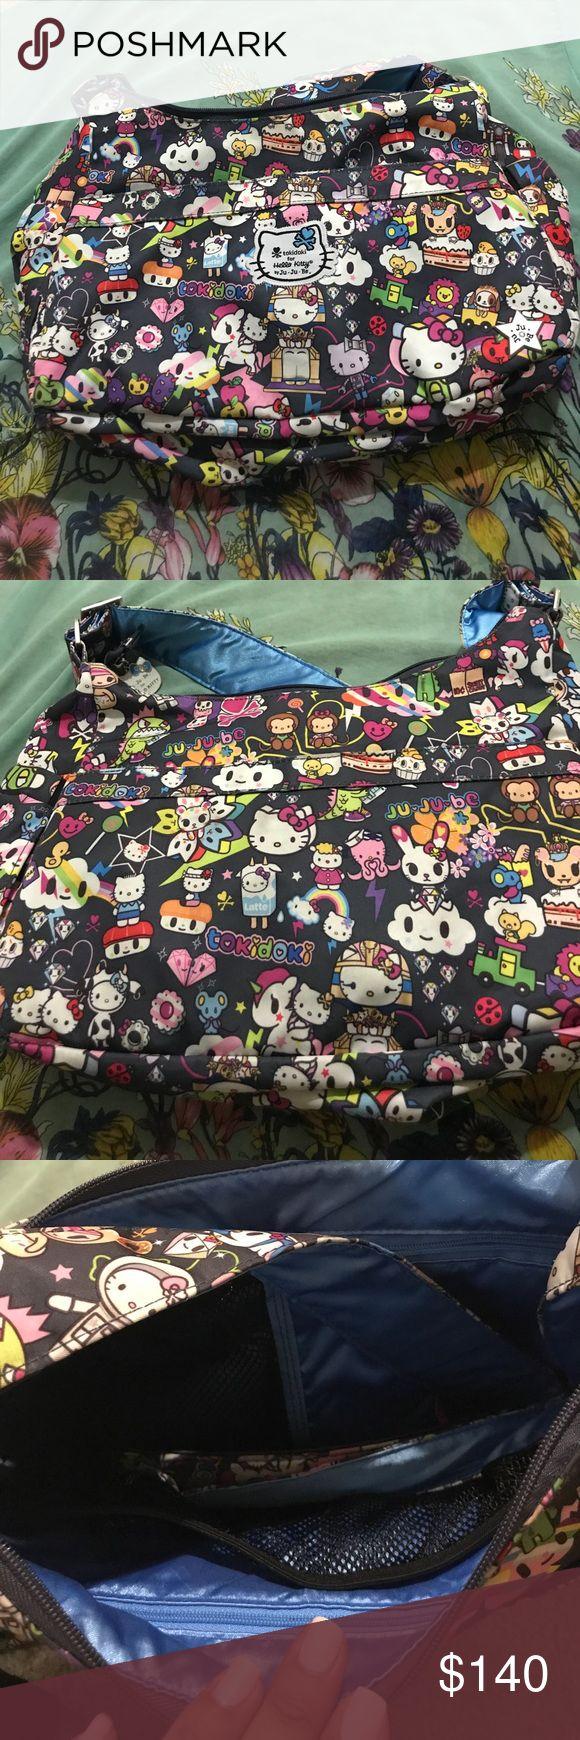 Tokidoki Hobobe Hello Kitty theme Bag Tokidoki Hobobe Hello Kitty theme Bag, gently used, changing pad included, machine washable tokidoki Bags Baby Bags